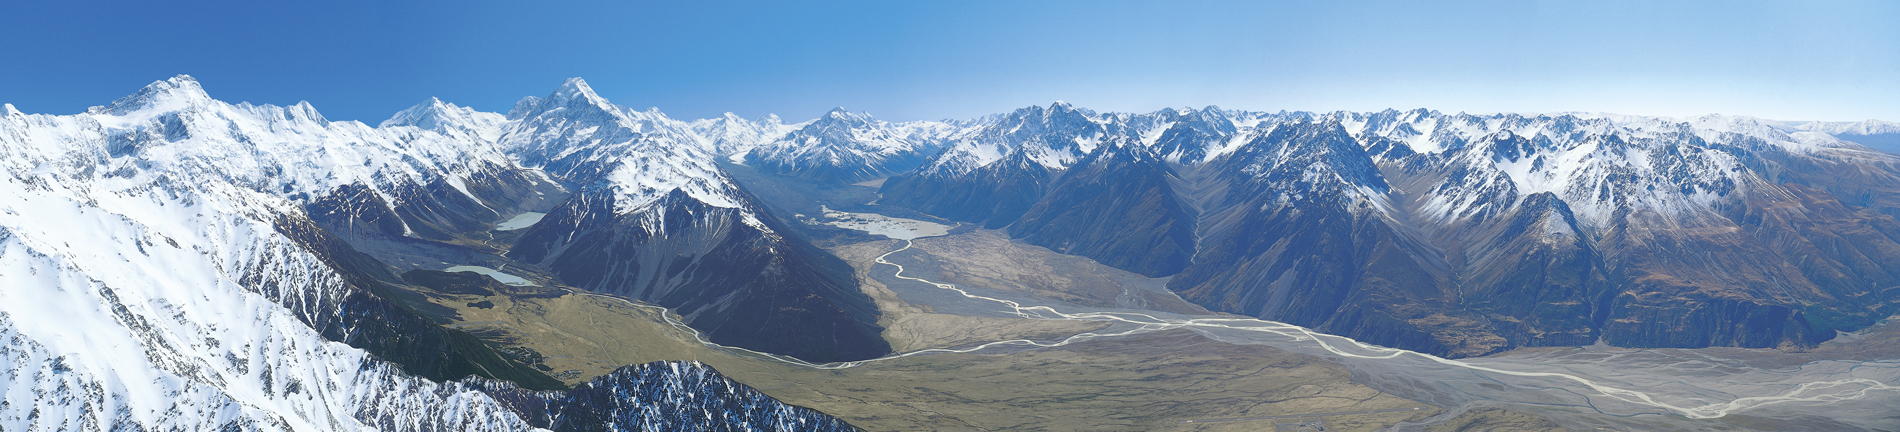 Aoraki Mt Cook panorama